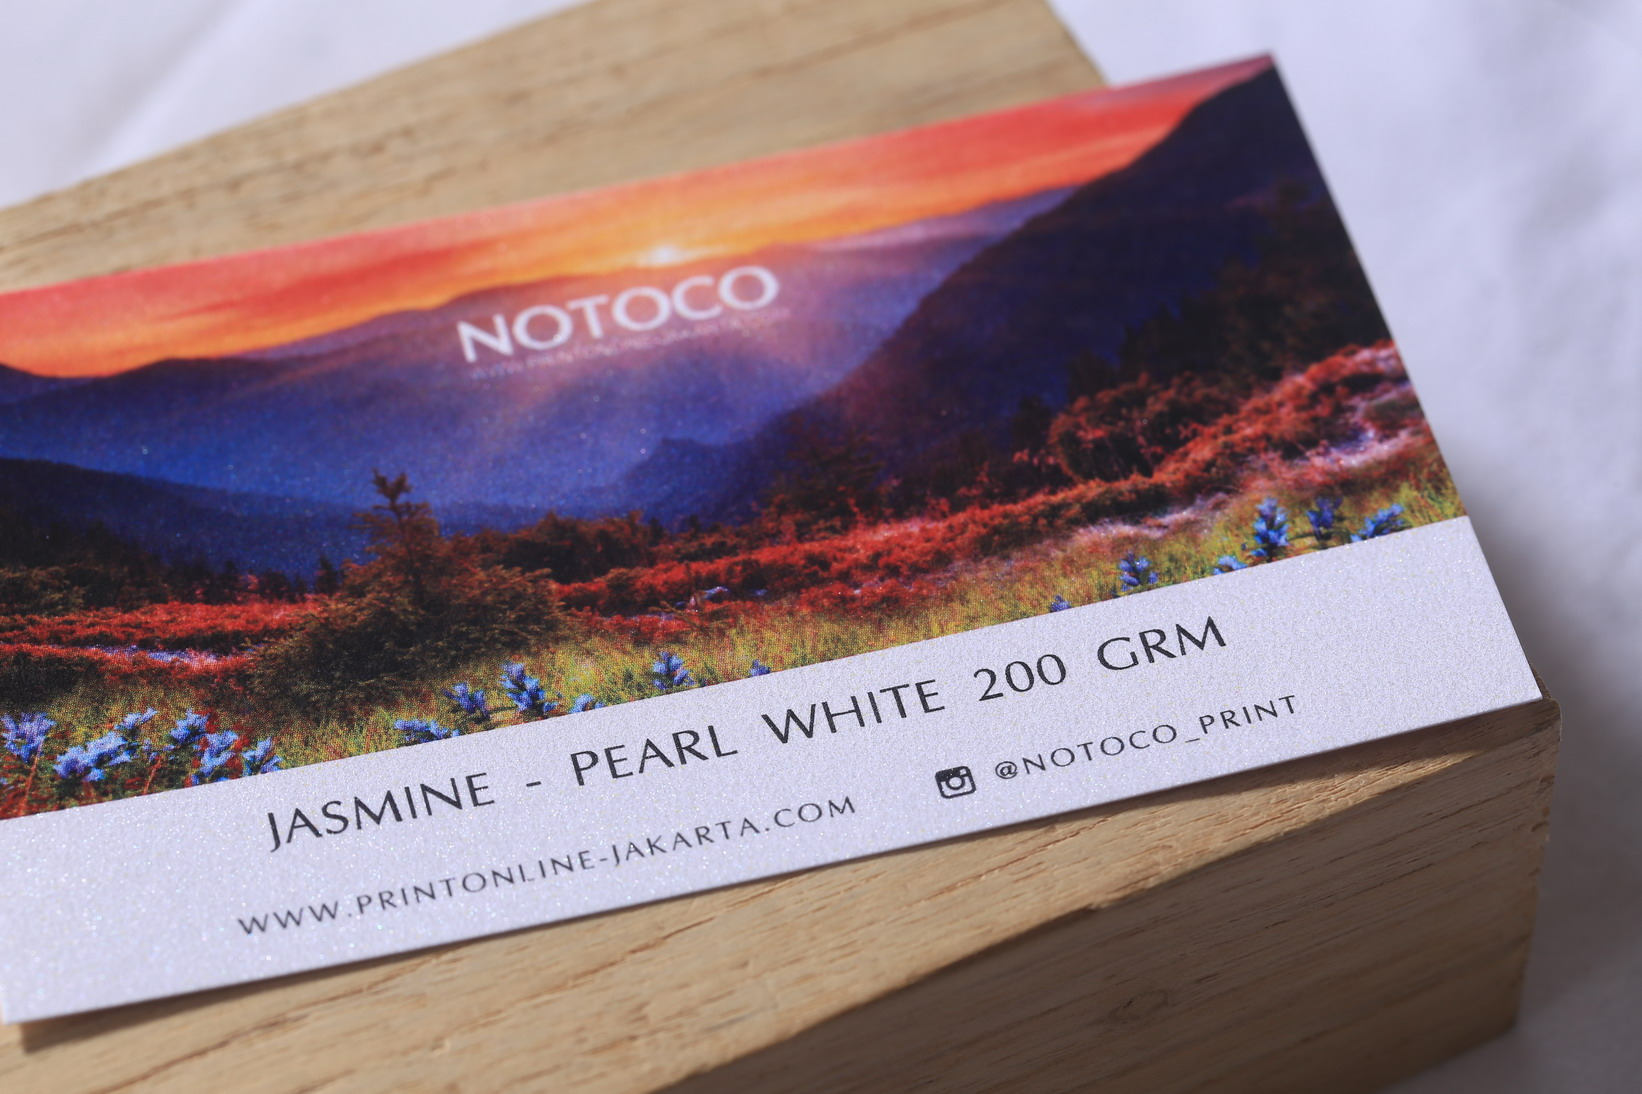 Jasmine Pearl White 200 grm